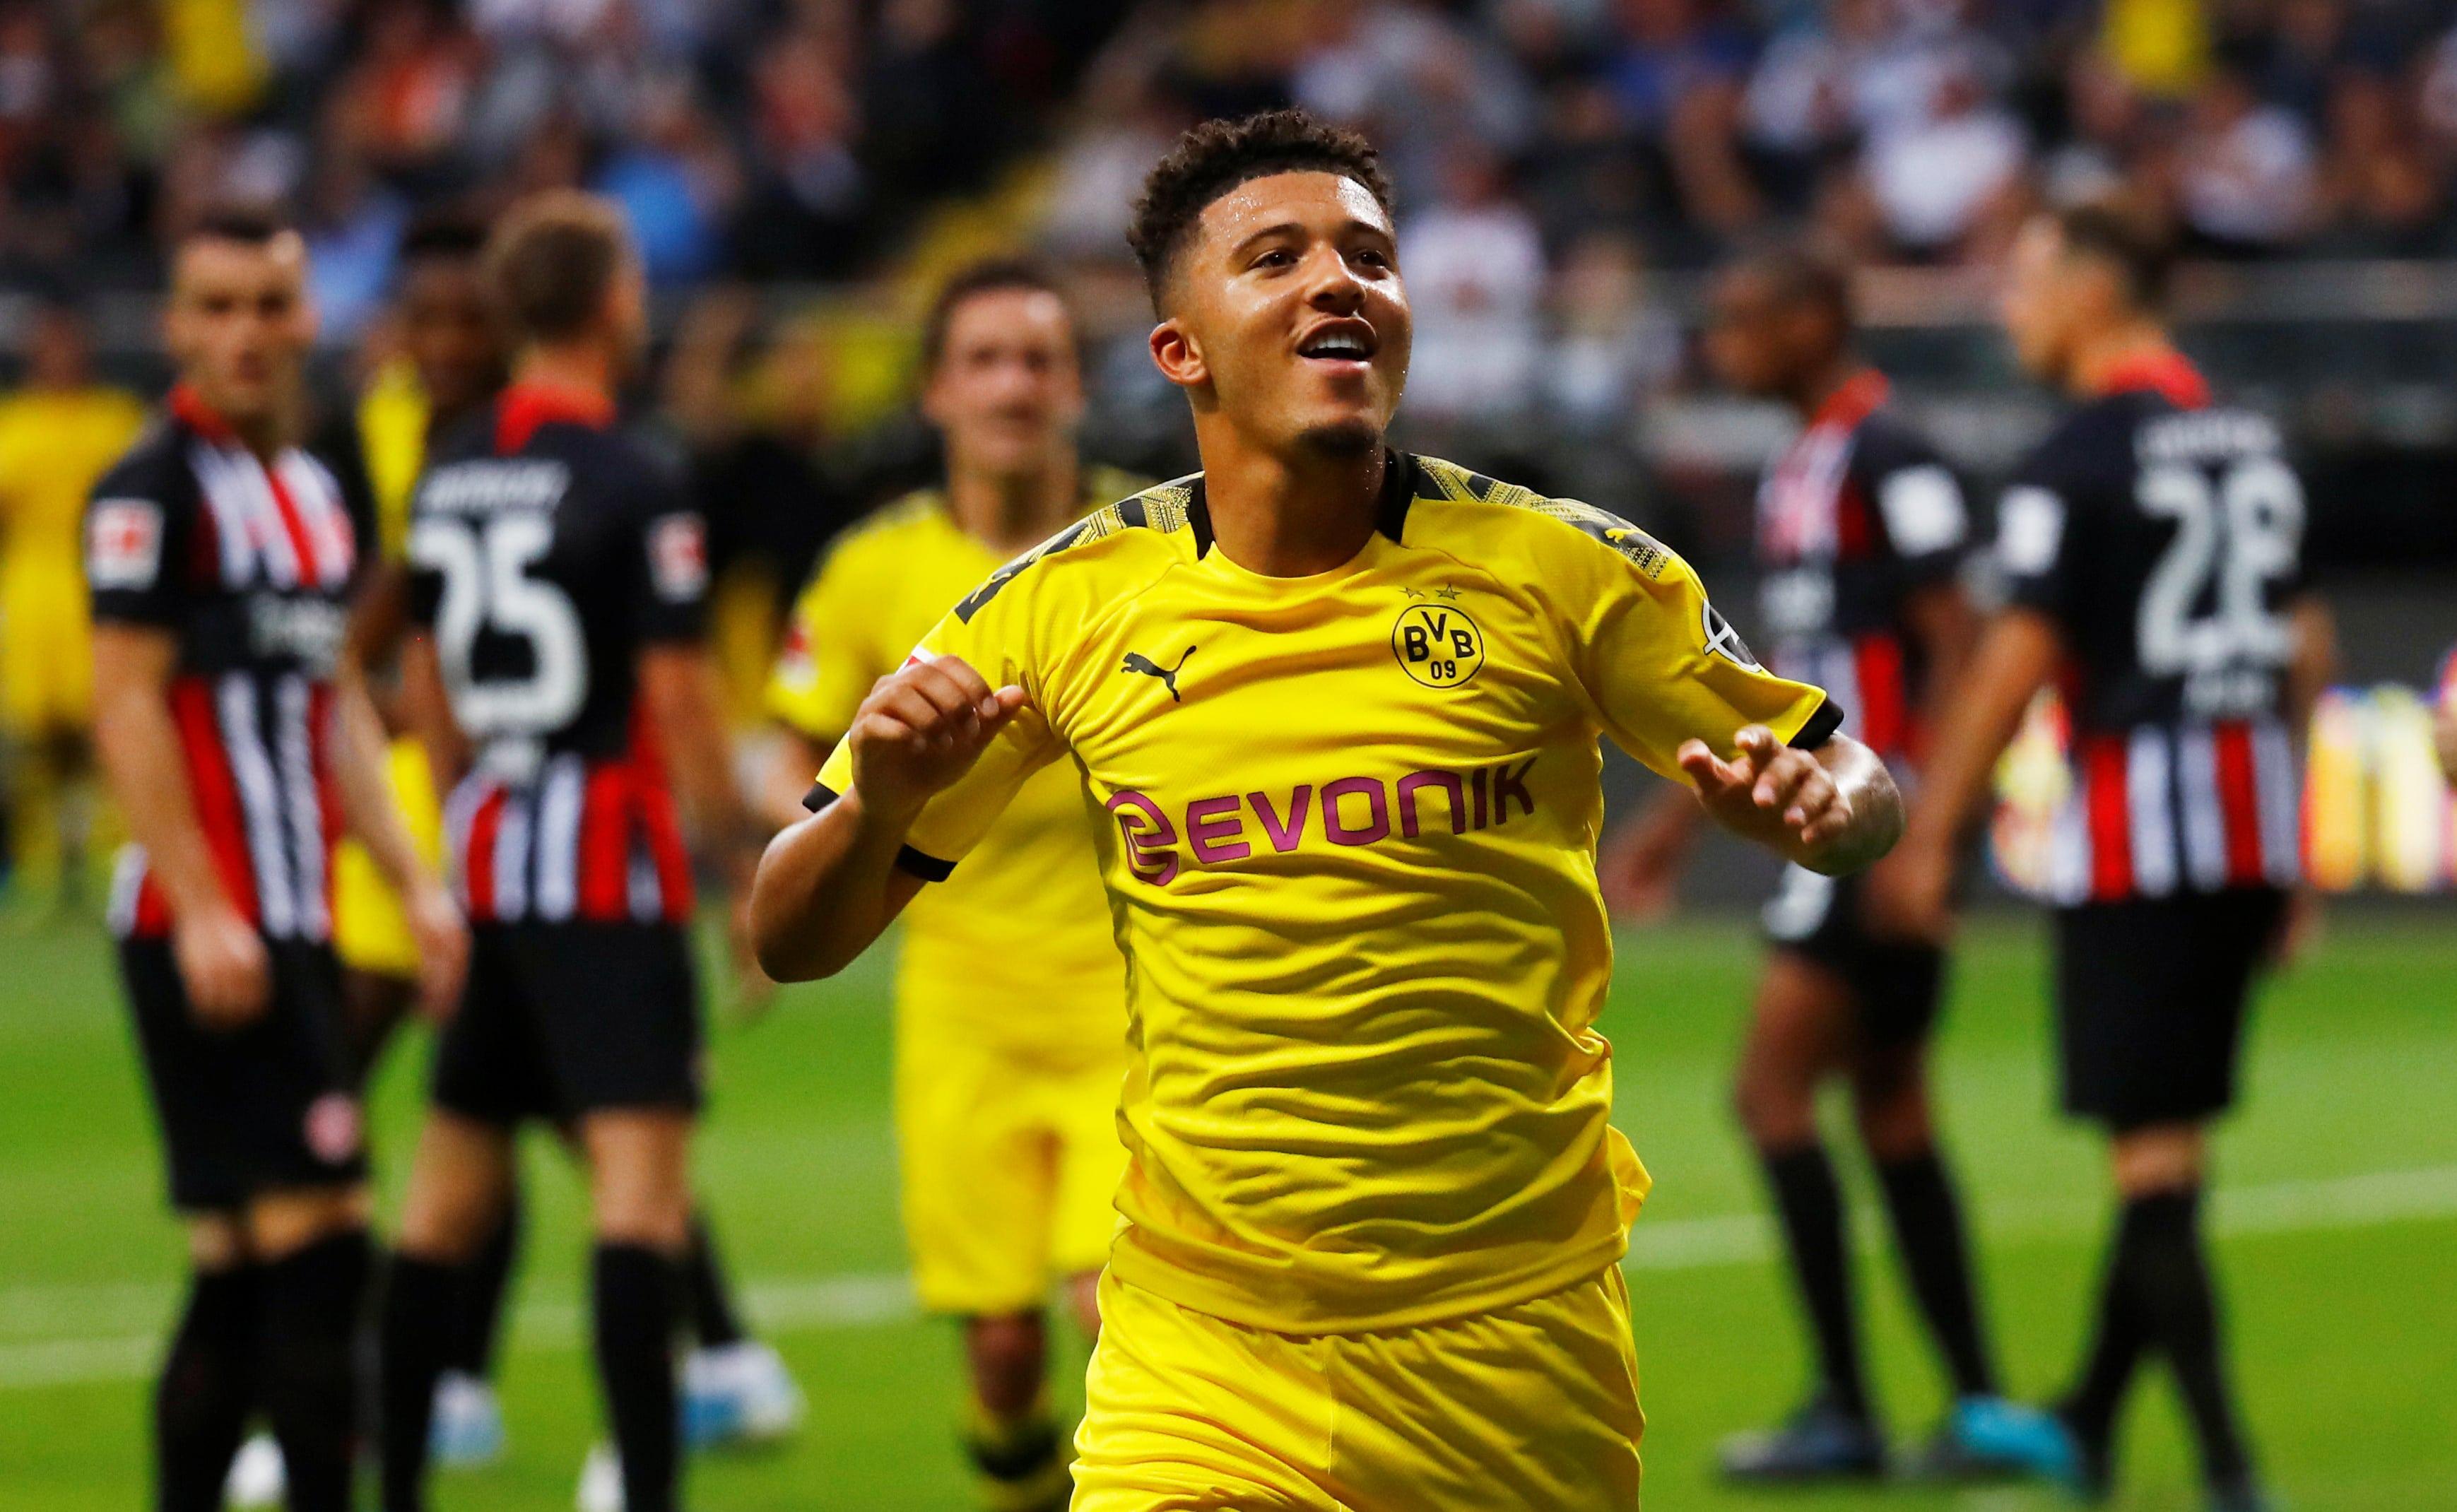 Jadon Sancho picks up Borussia Dortmund's player of the month award